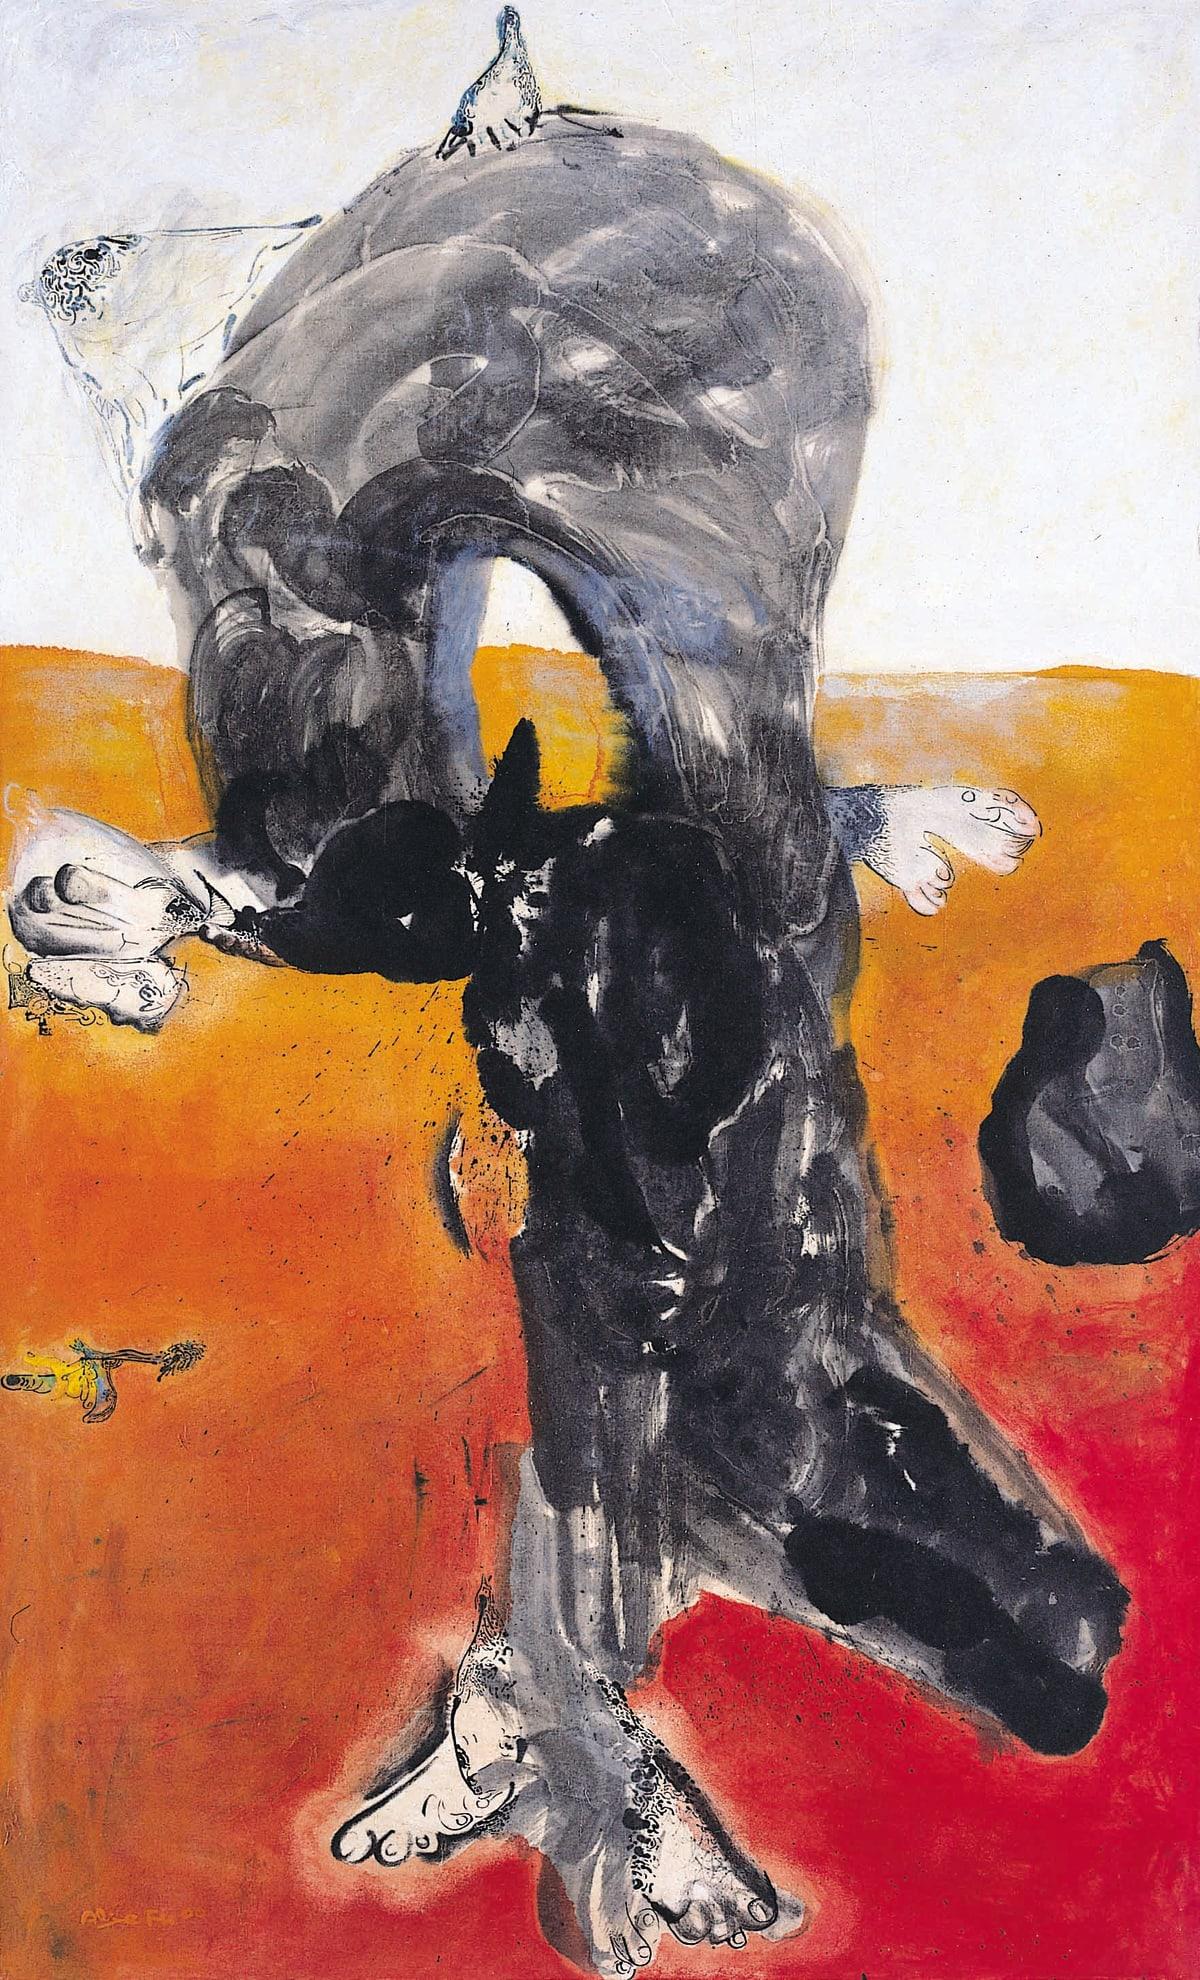 Alixe Fu, Plante-homme I, 2000